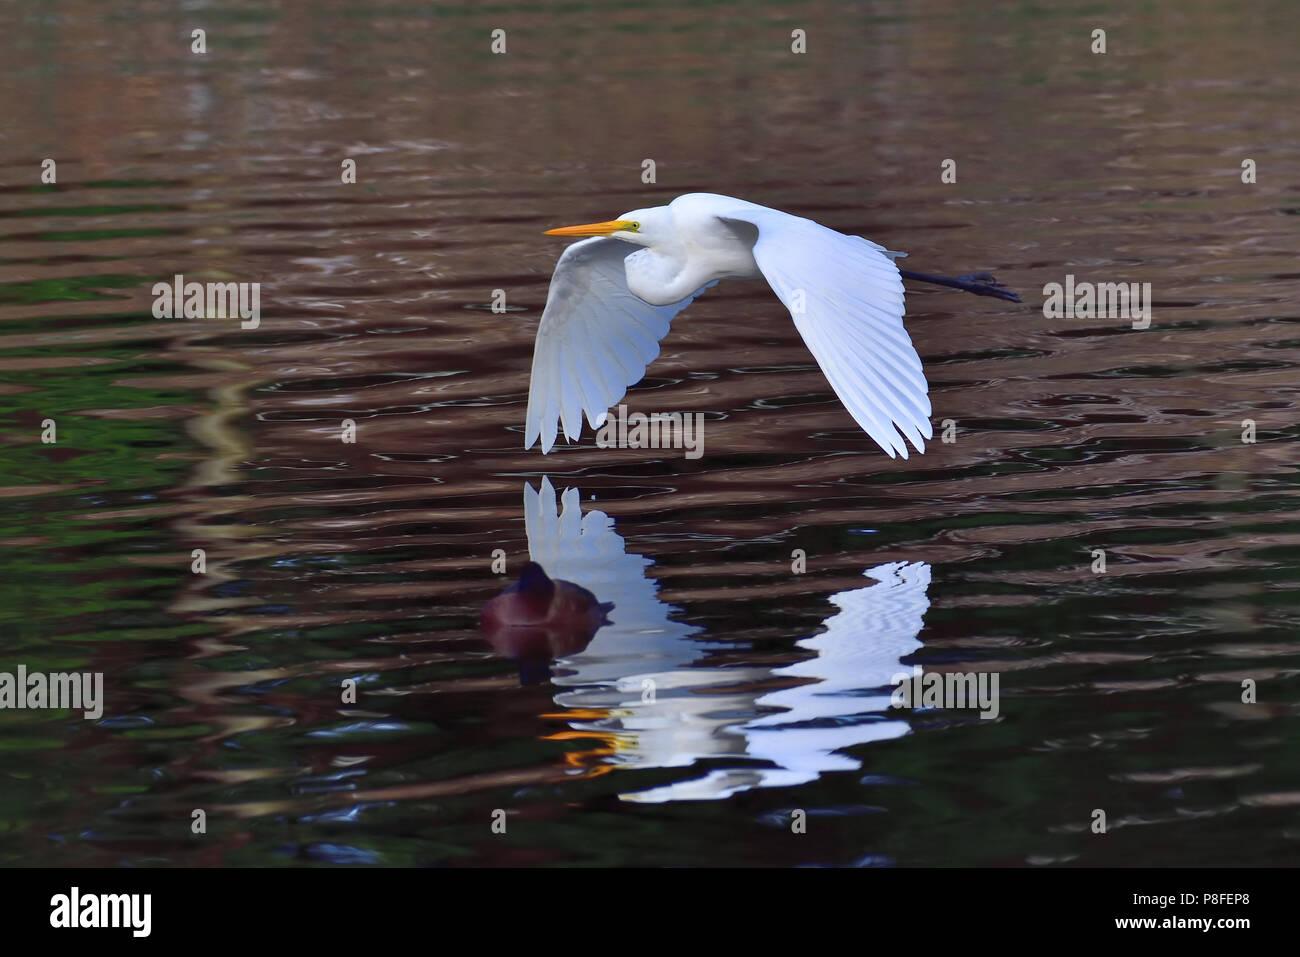 An Australian, Queensland nonbreeding Great Egret ( Ardea alba ) flying over a Lagoon - Stock Image